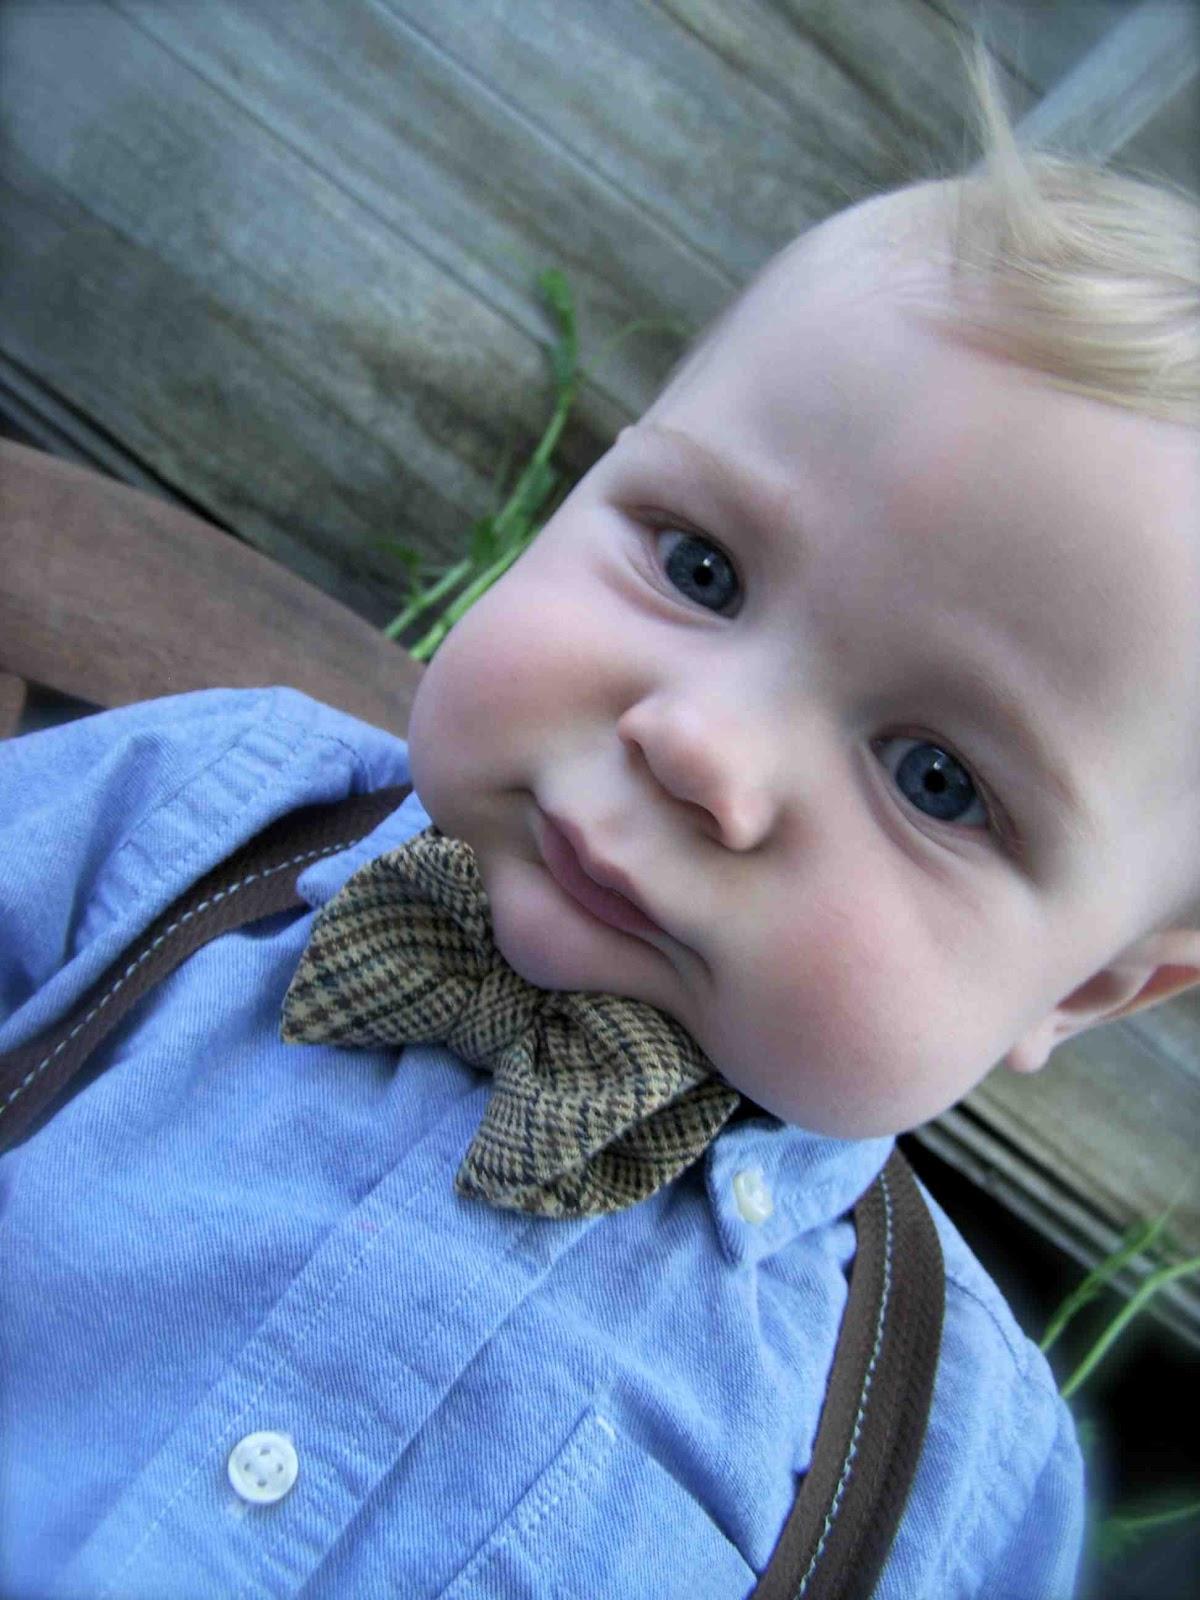 http://3.bp.blogspot.com/-FrwJSV_YzwI/T7sE_oXxD4I/AAAAAAAAElg/xNeCwBunYcQ/s1600/baby+bow+tie+tutorial.jpg